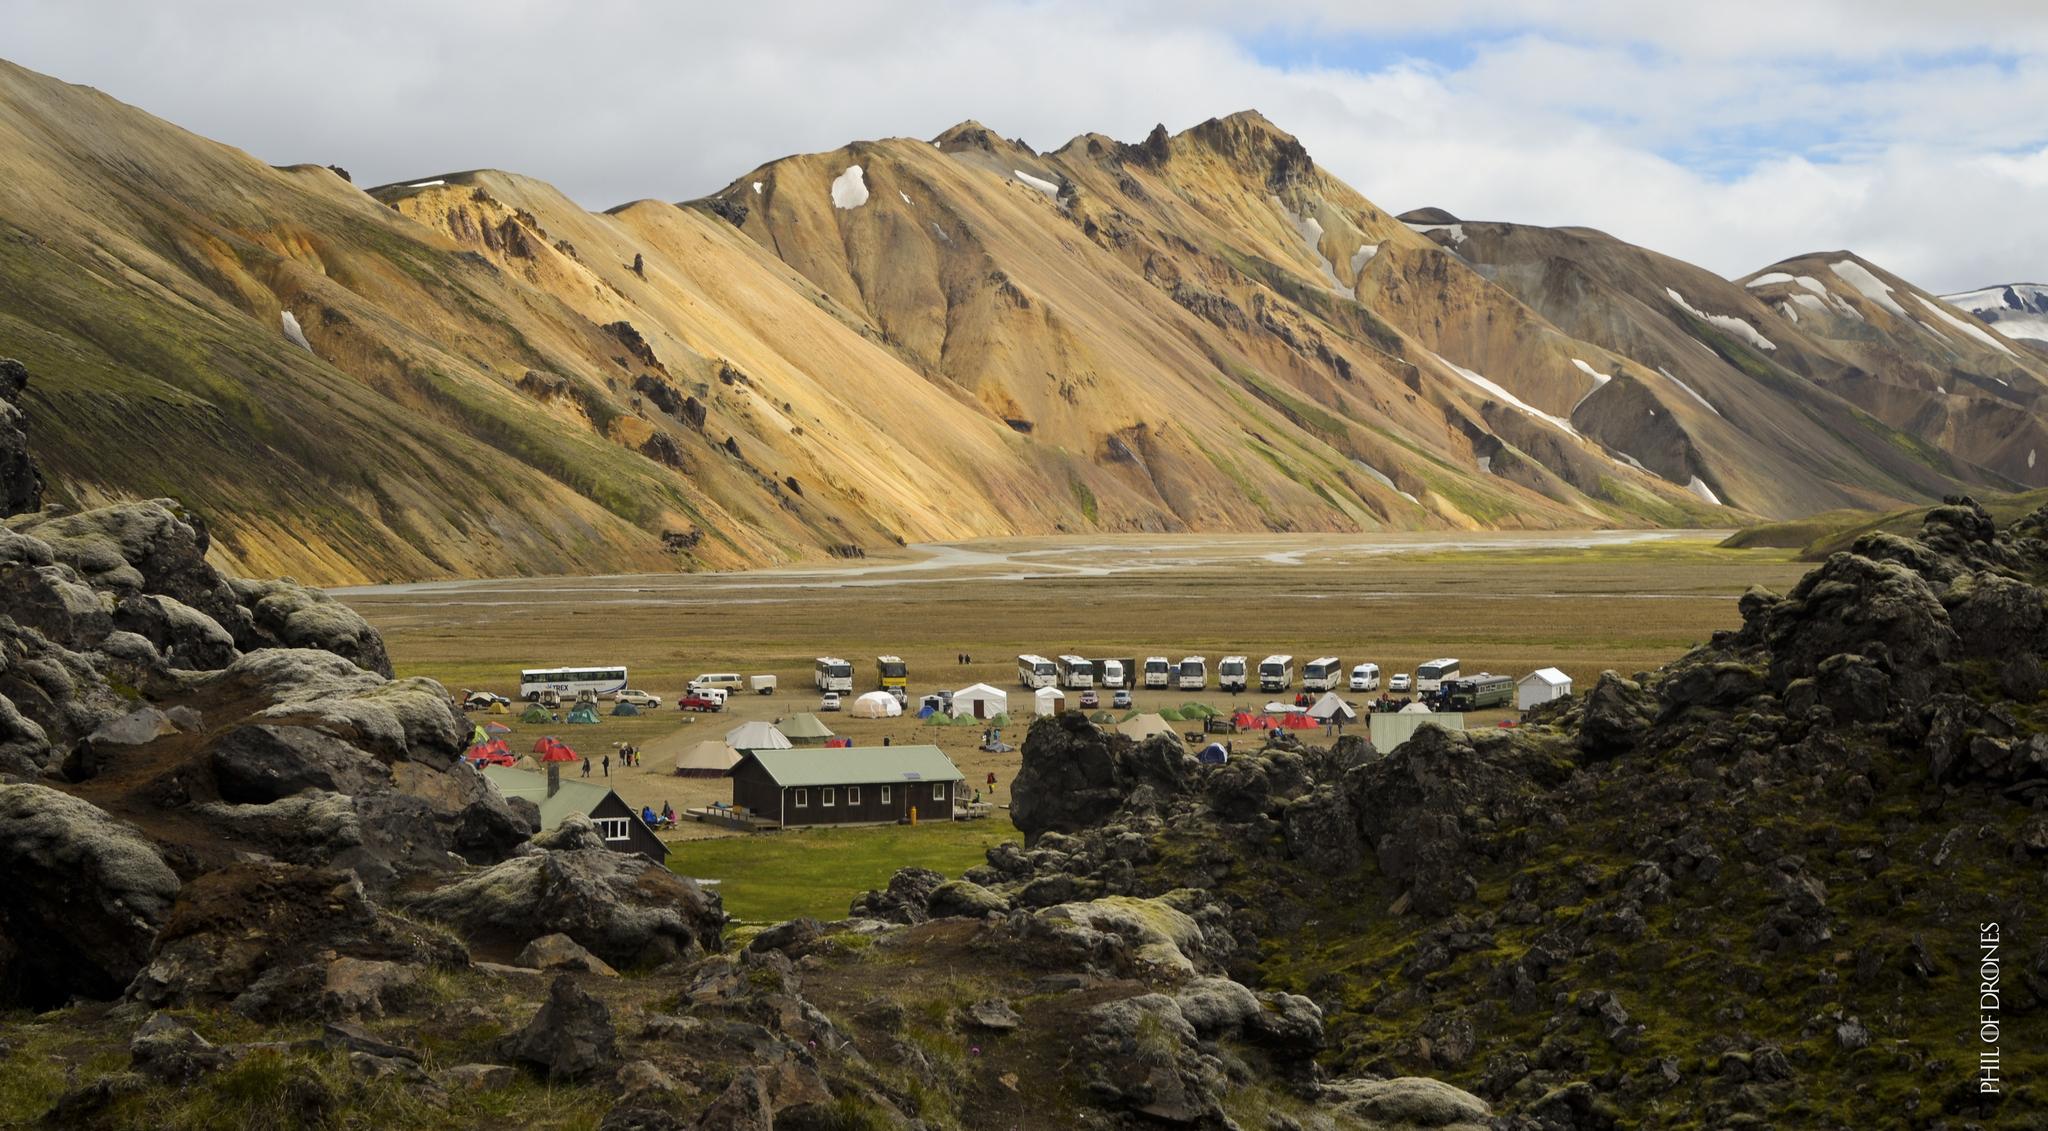 Islande 2013-3-PhM copy.jpg